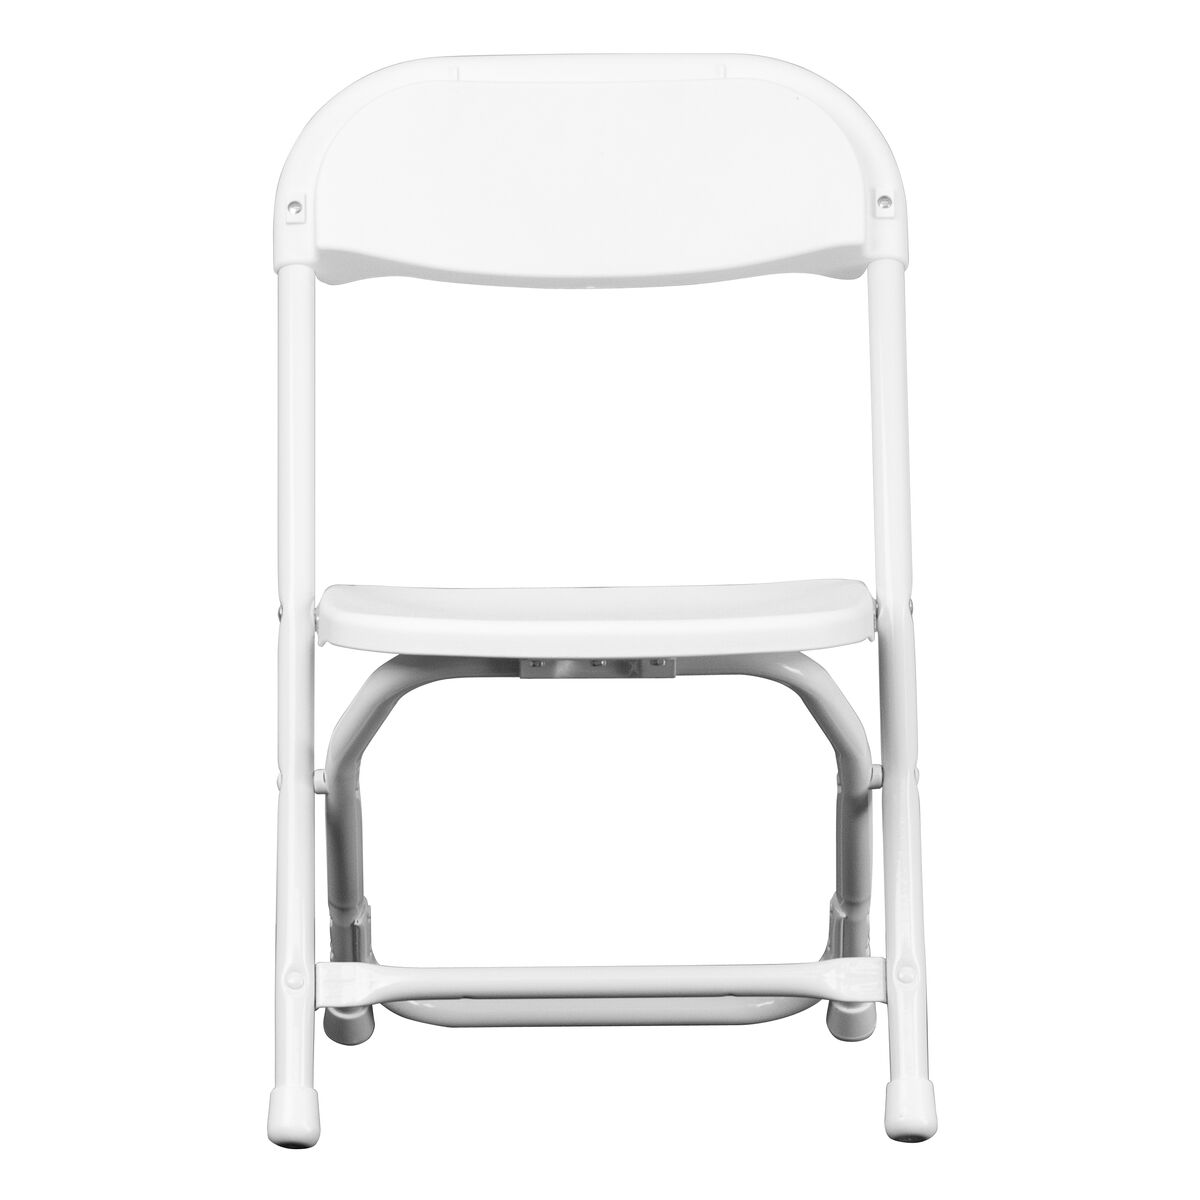 Flash Furniture Kids White Plastic Folding Chair Y Kid Wh